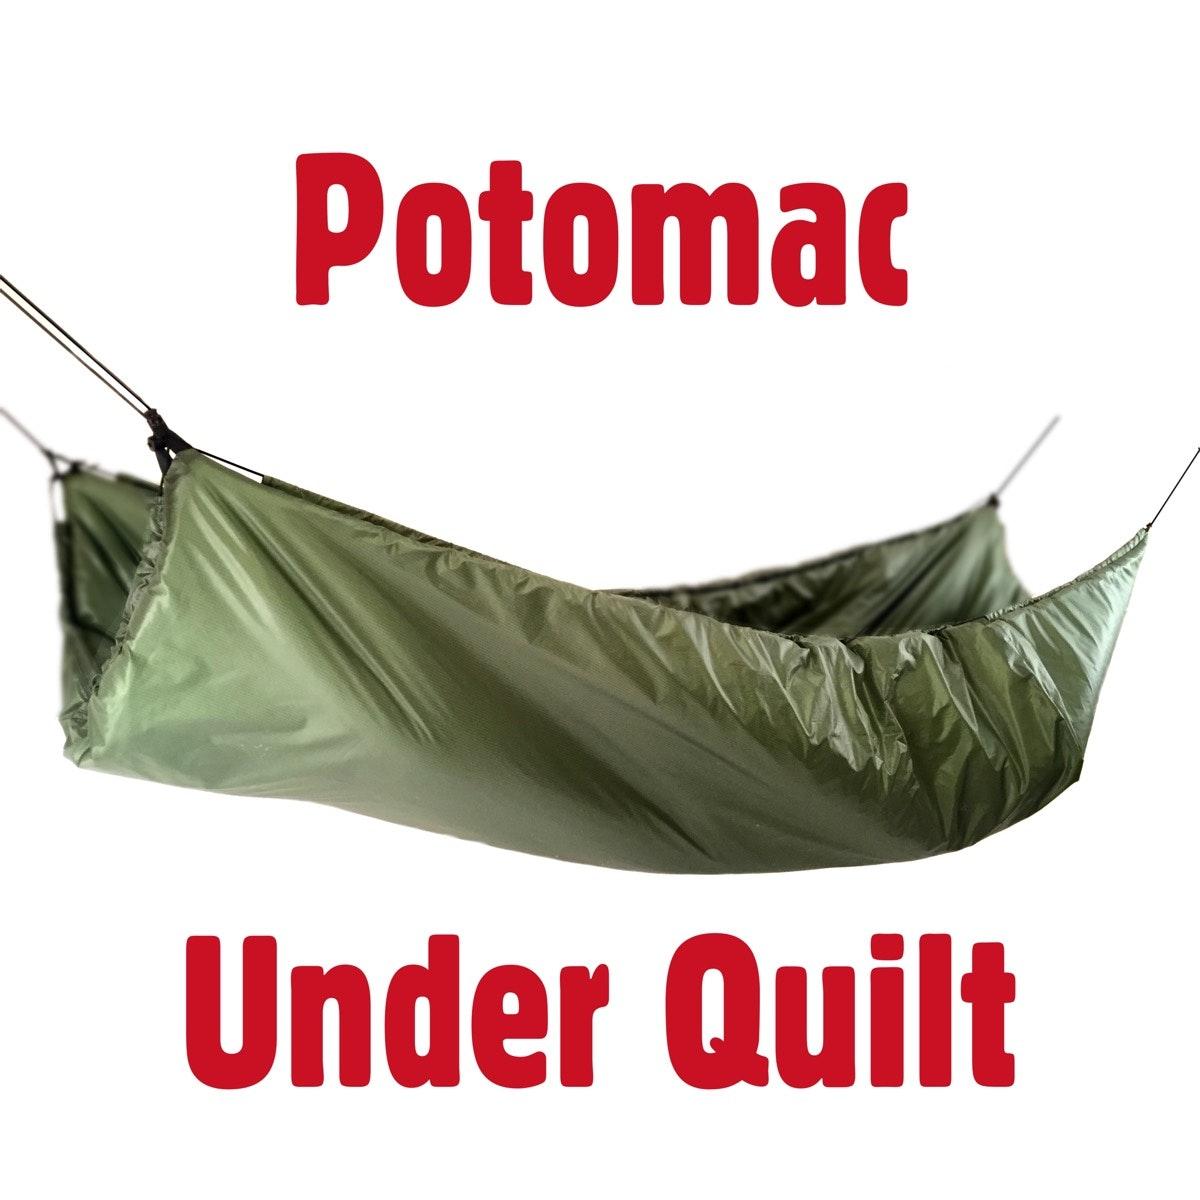 Potomac UnderQuilt